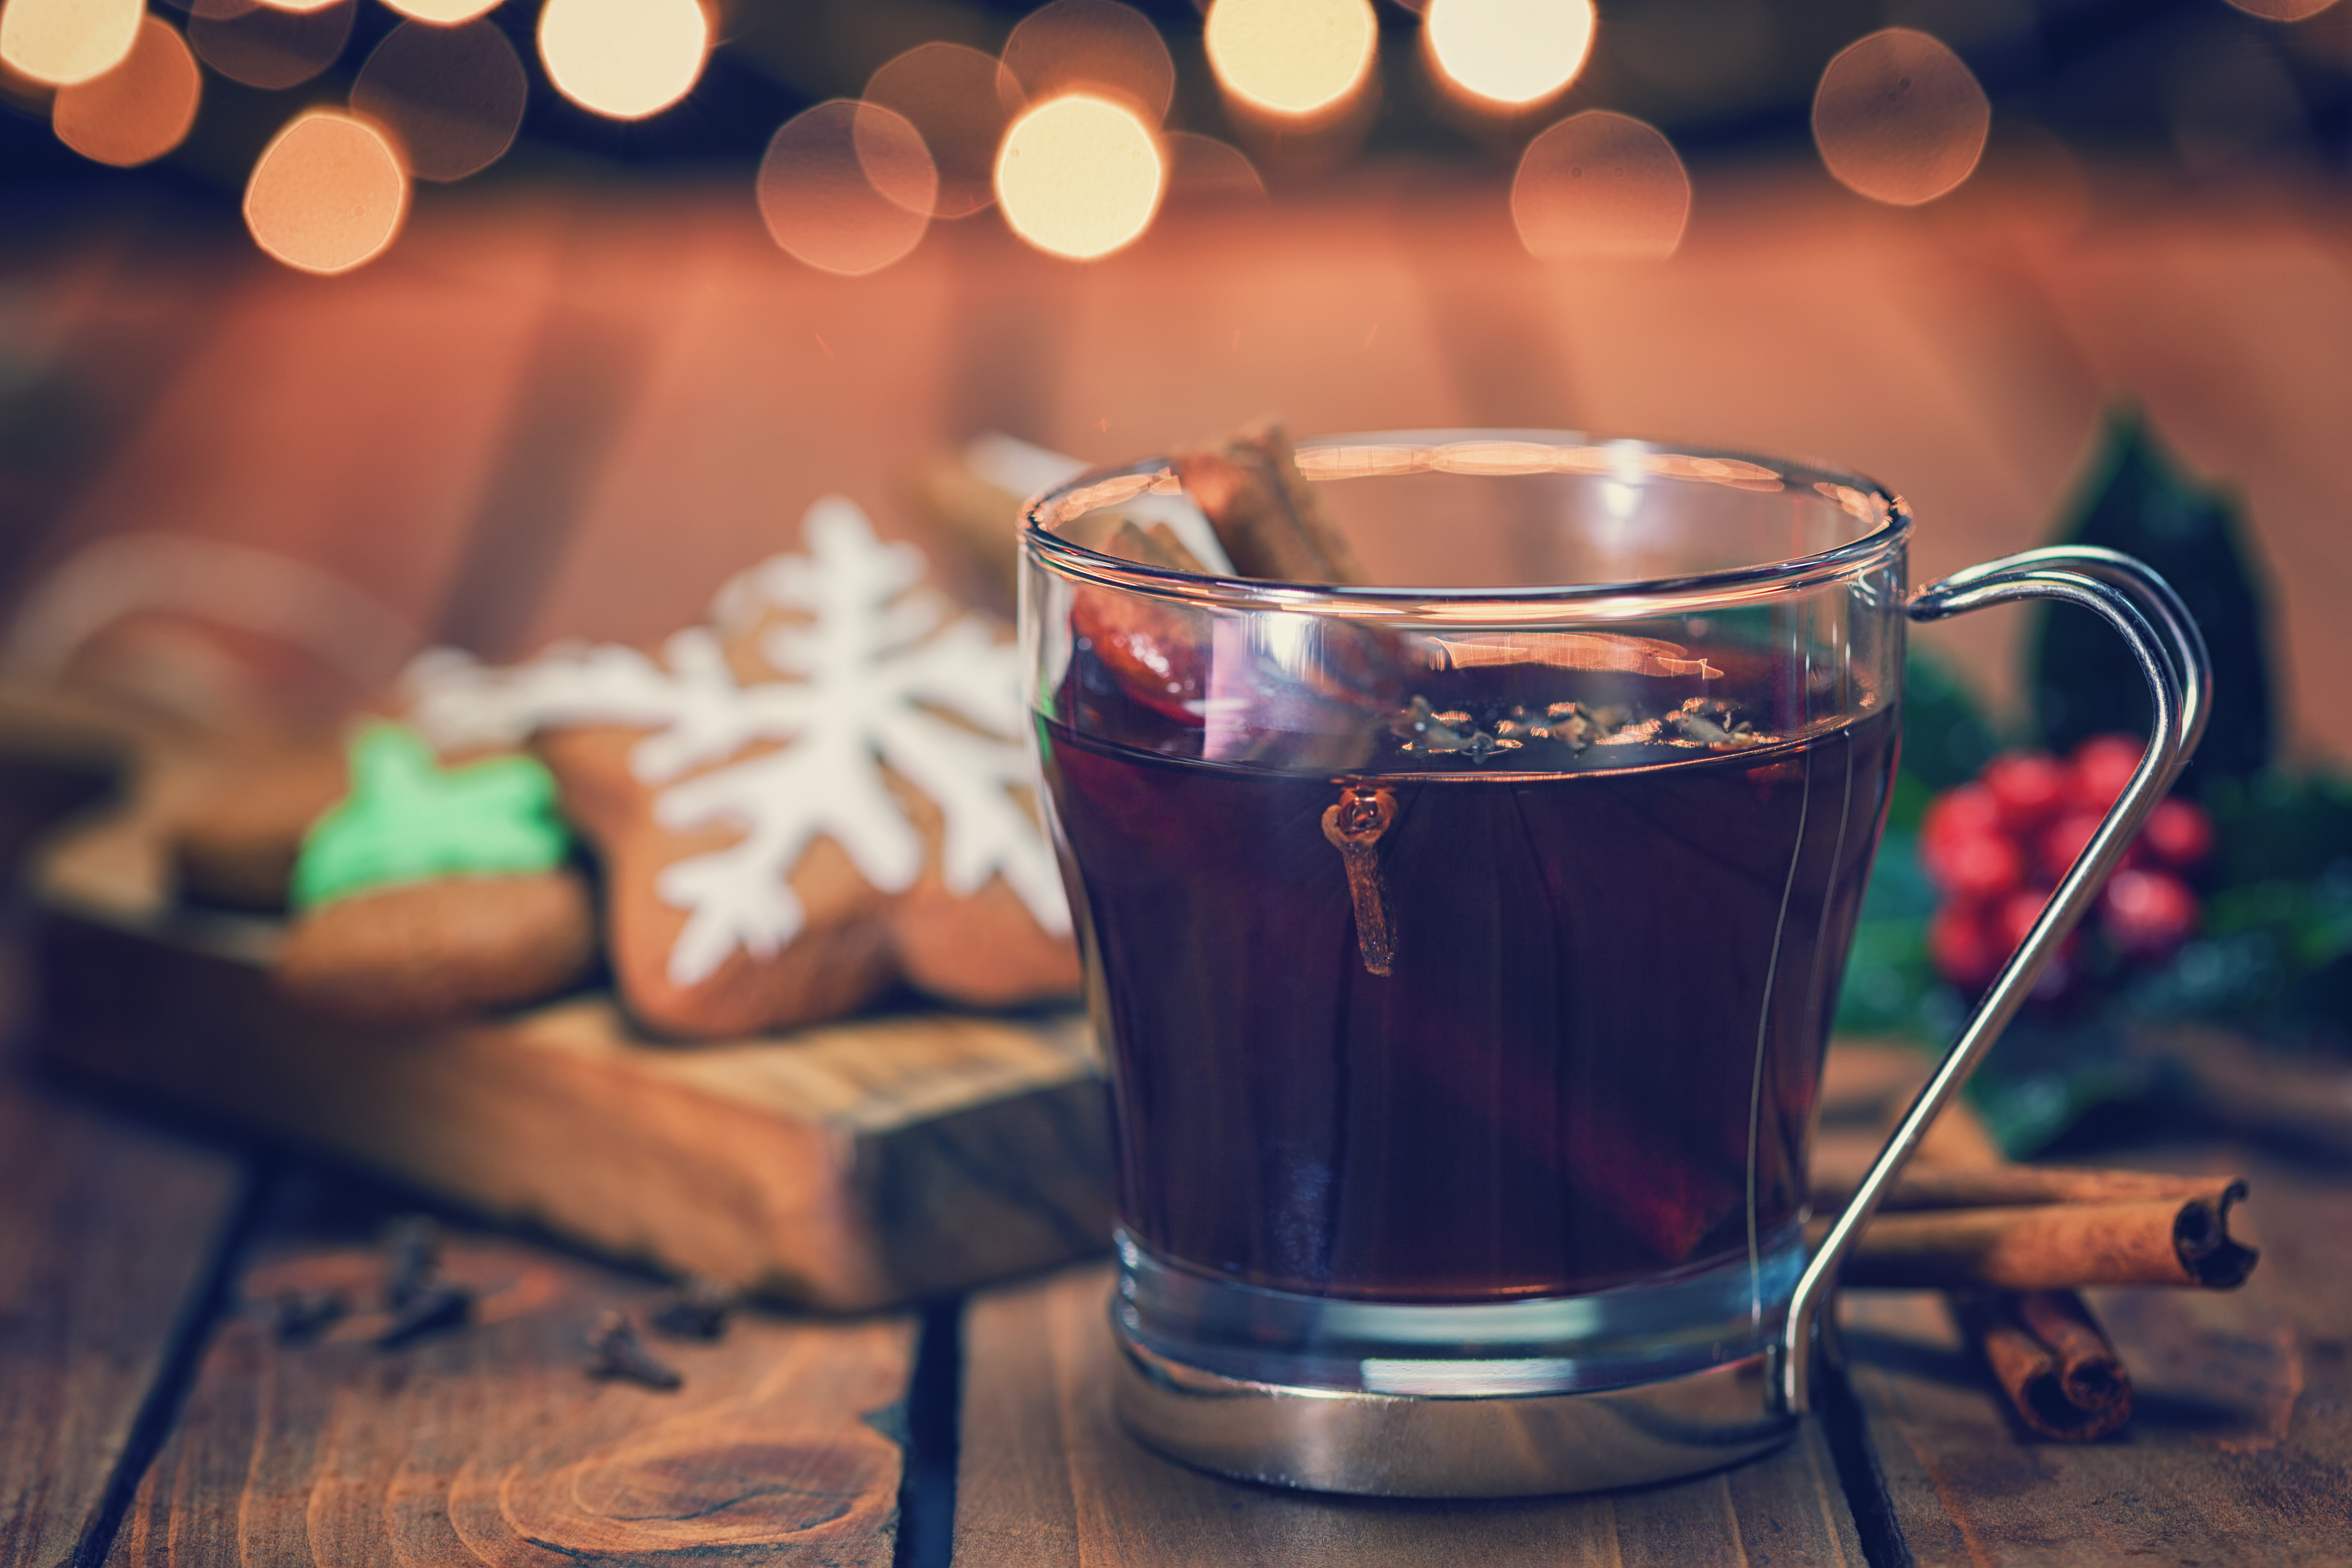 Glühwein Cocktail Recipe - mulled wine- spiced wine -holiday cocktail-holiday beverage -warm beverage recipe